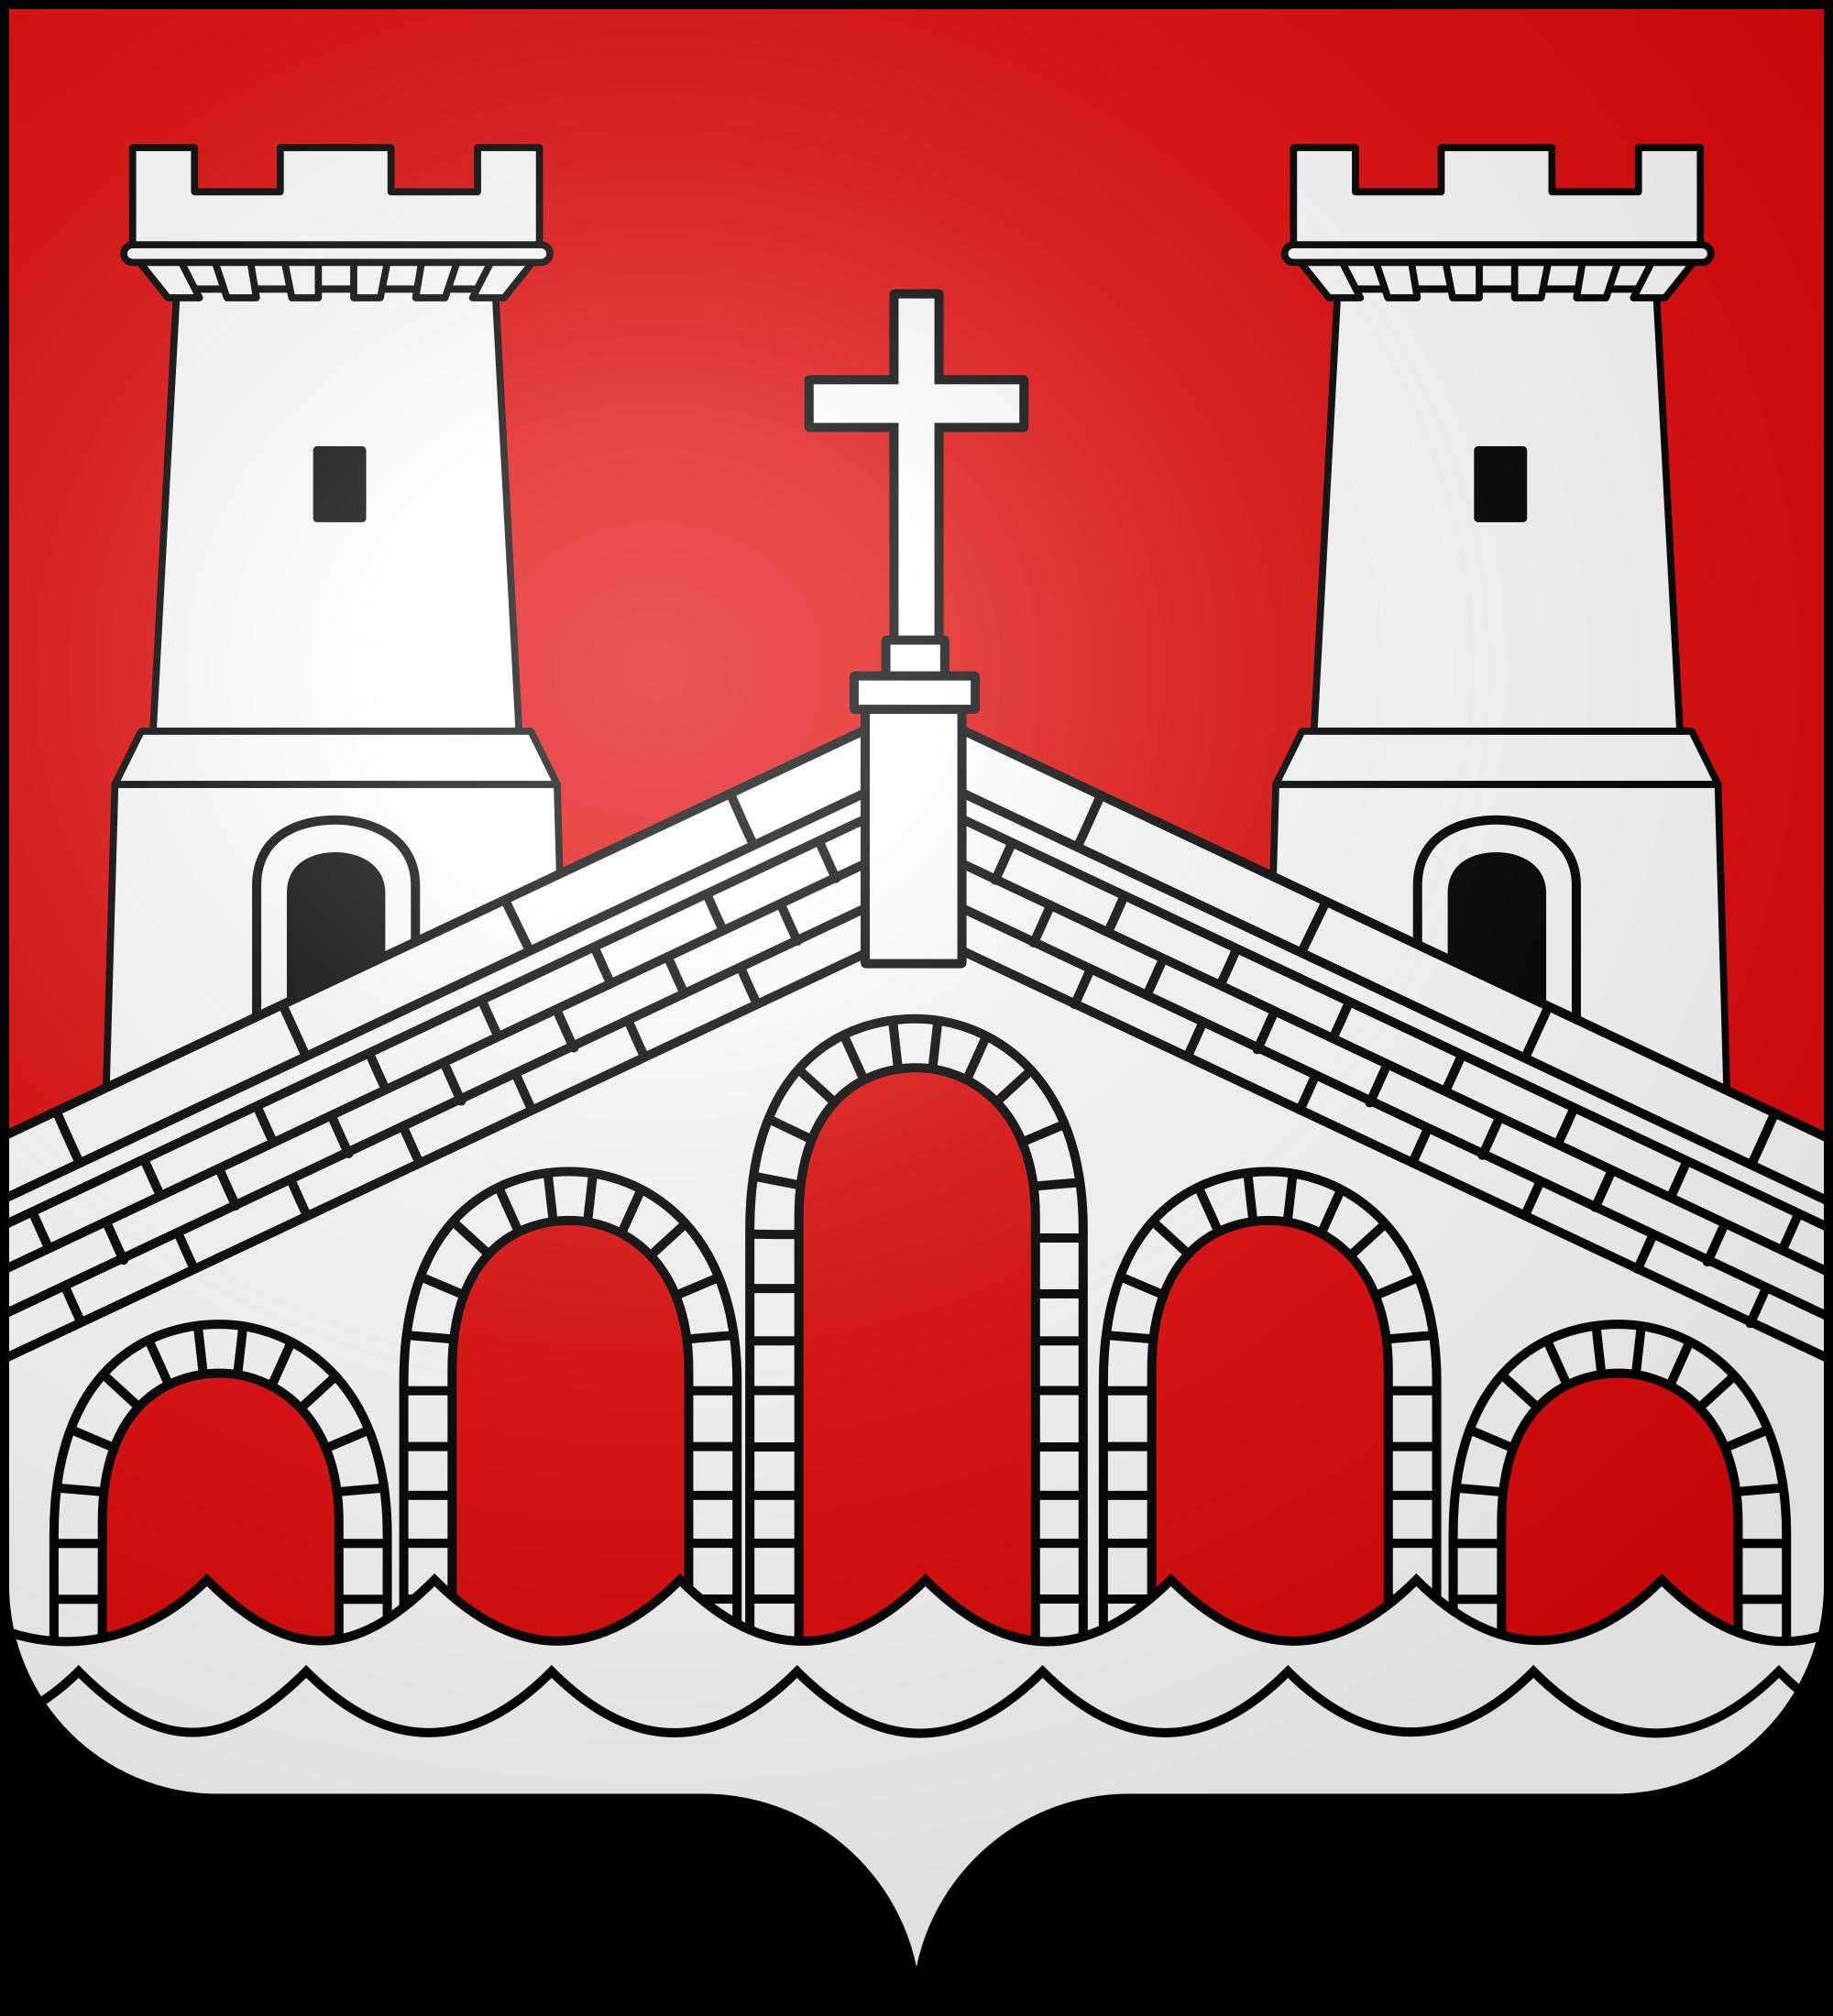 File:Blason ville fr Sommières (Gard).svg.